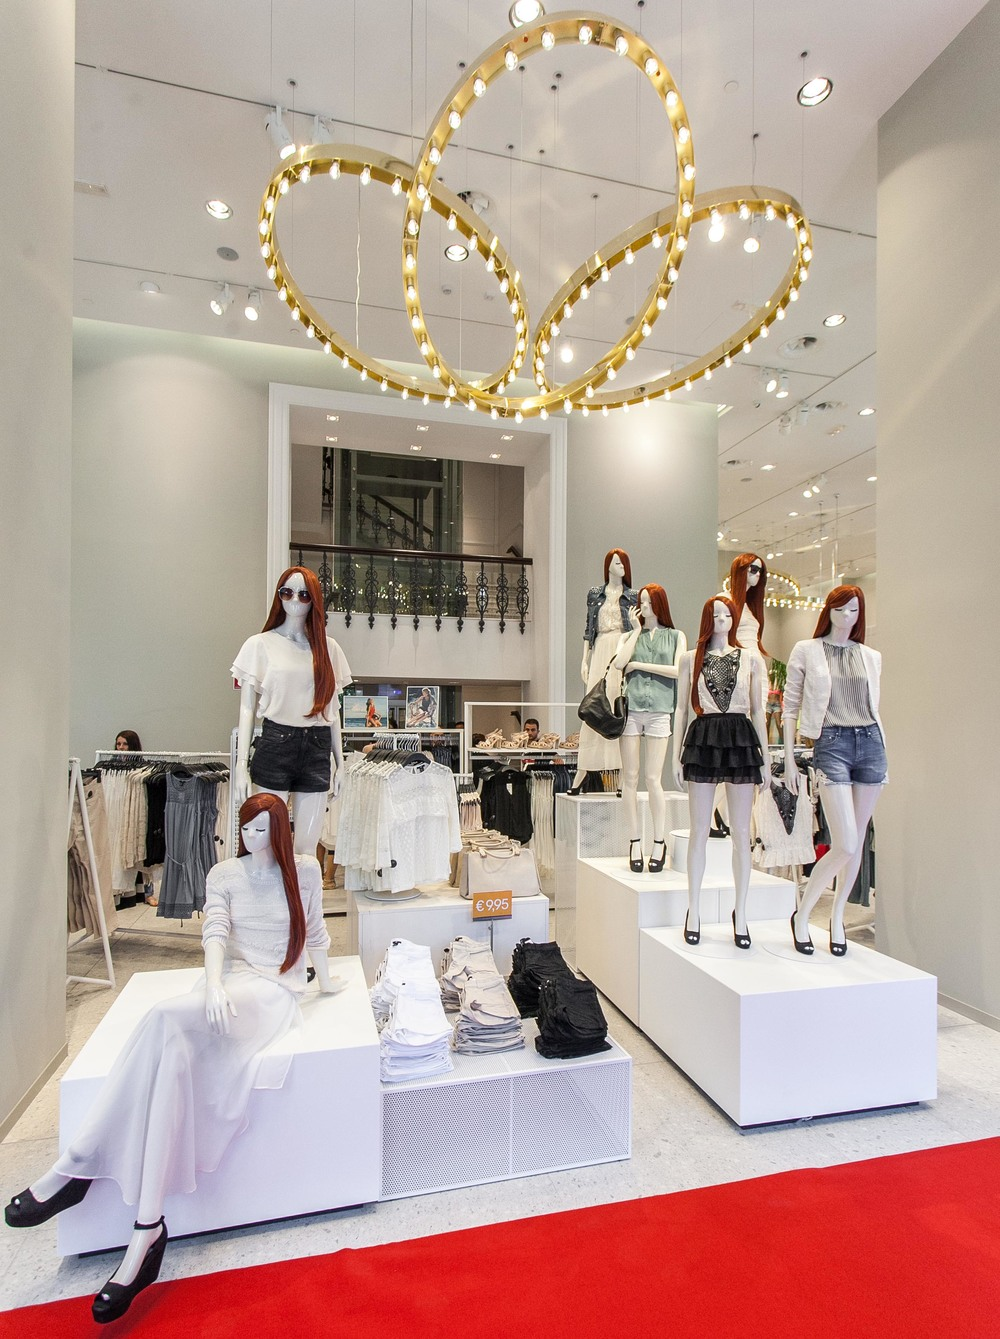 http-__www.spyroskanatas.com_wp-content_gallery_hm_new_store_piraeus_hm_piraeus_store_07.jpg